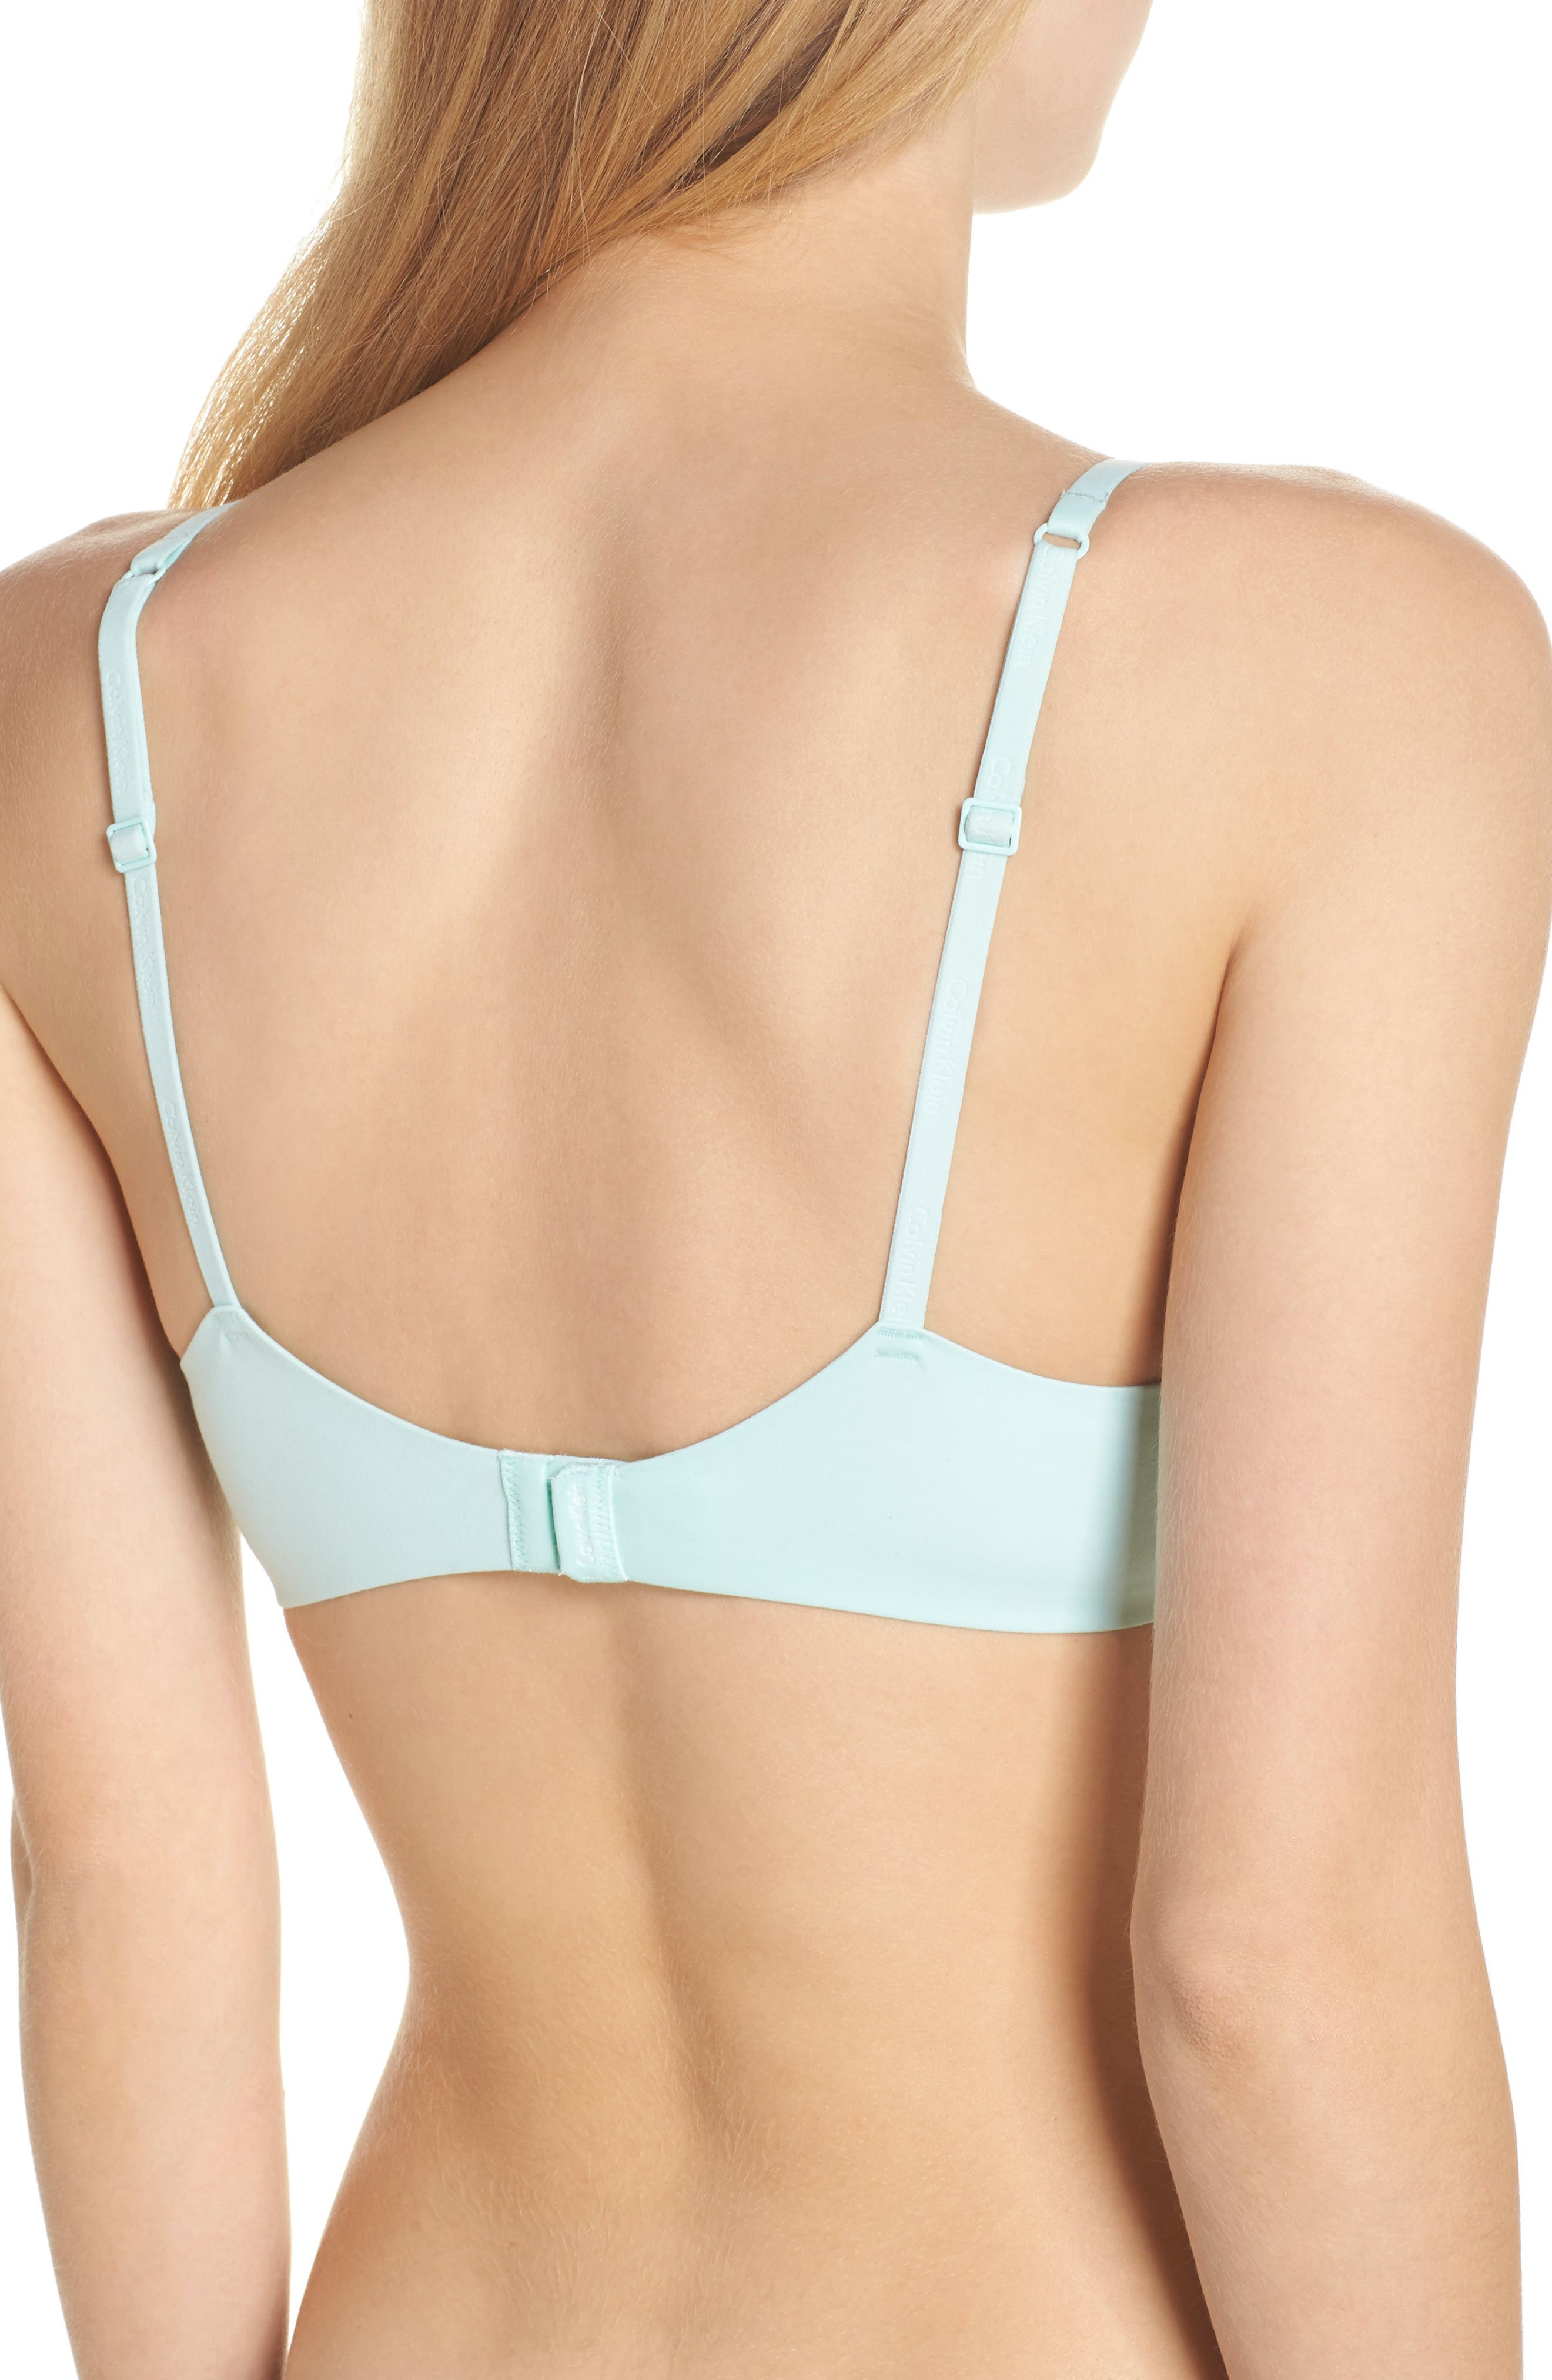 Alternate Image 2  - Calvin Klein 'Perfectly Fit - Modern' T-Shirt Bra